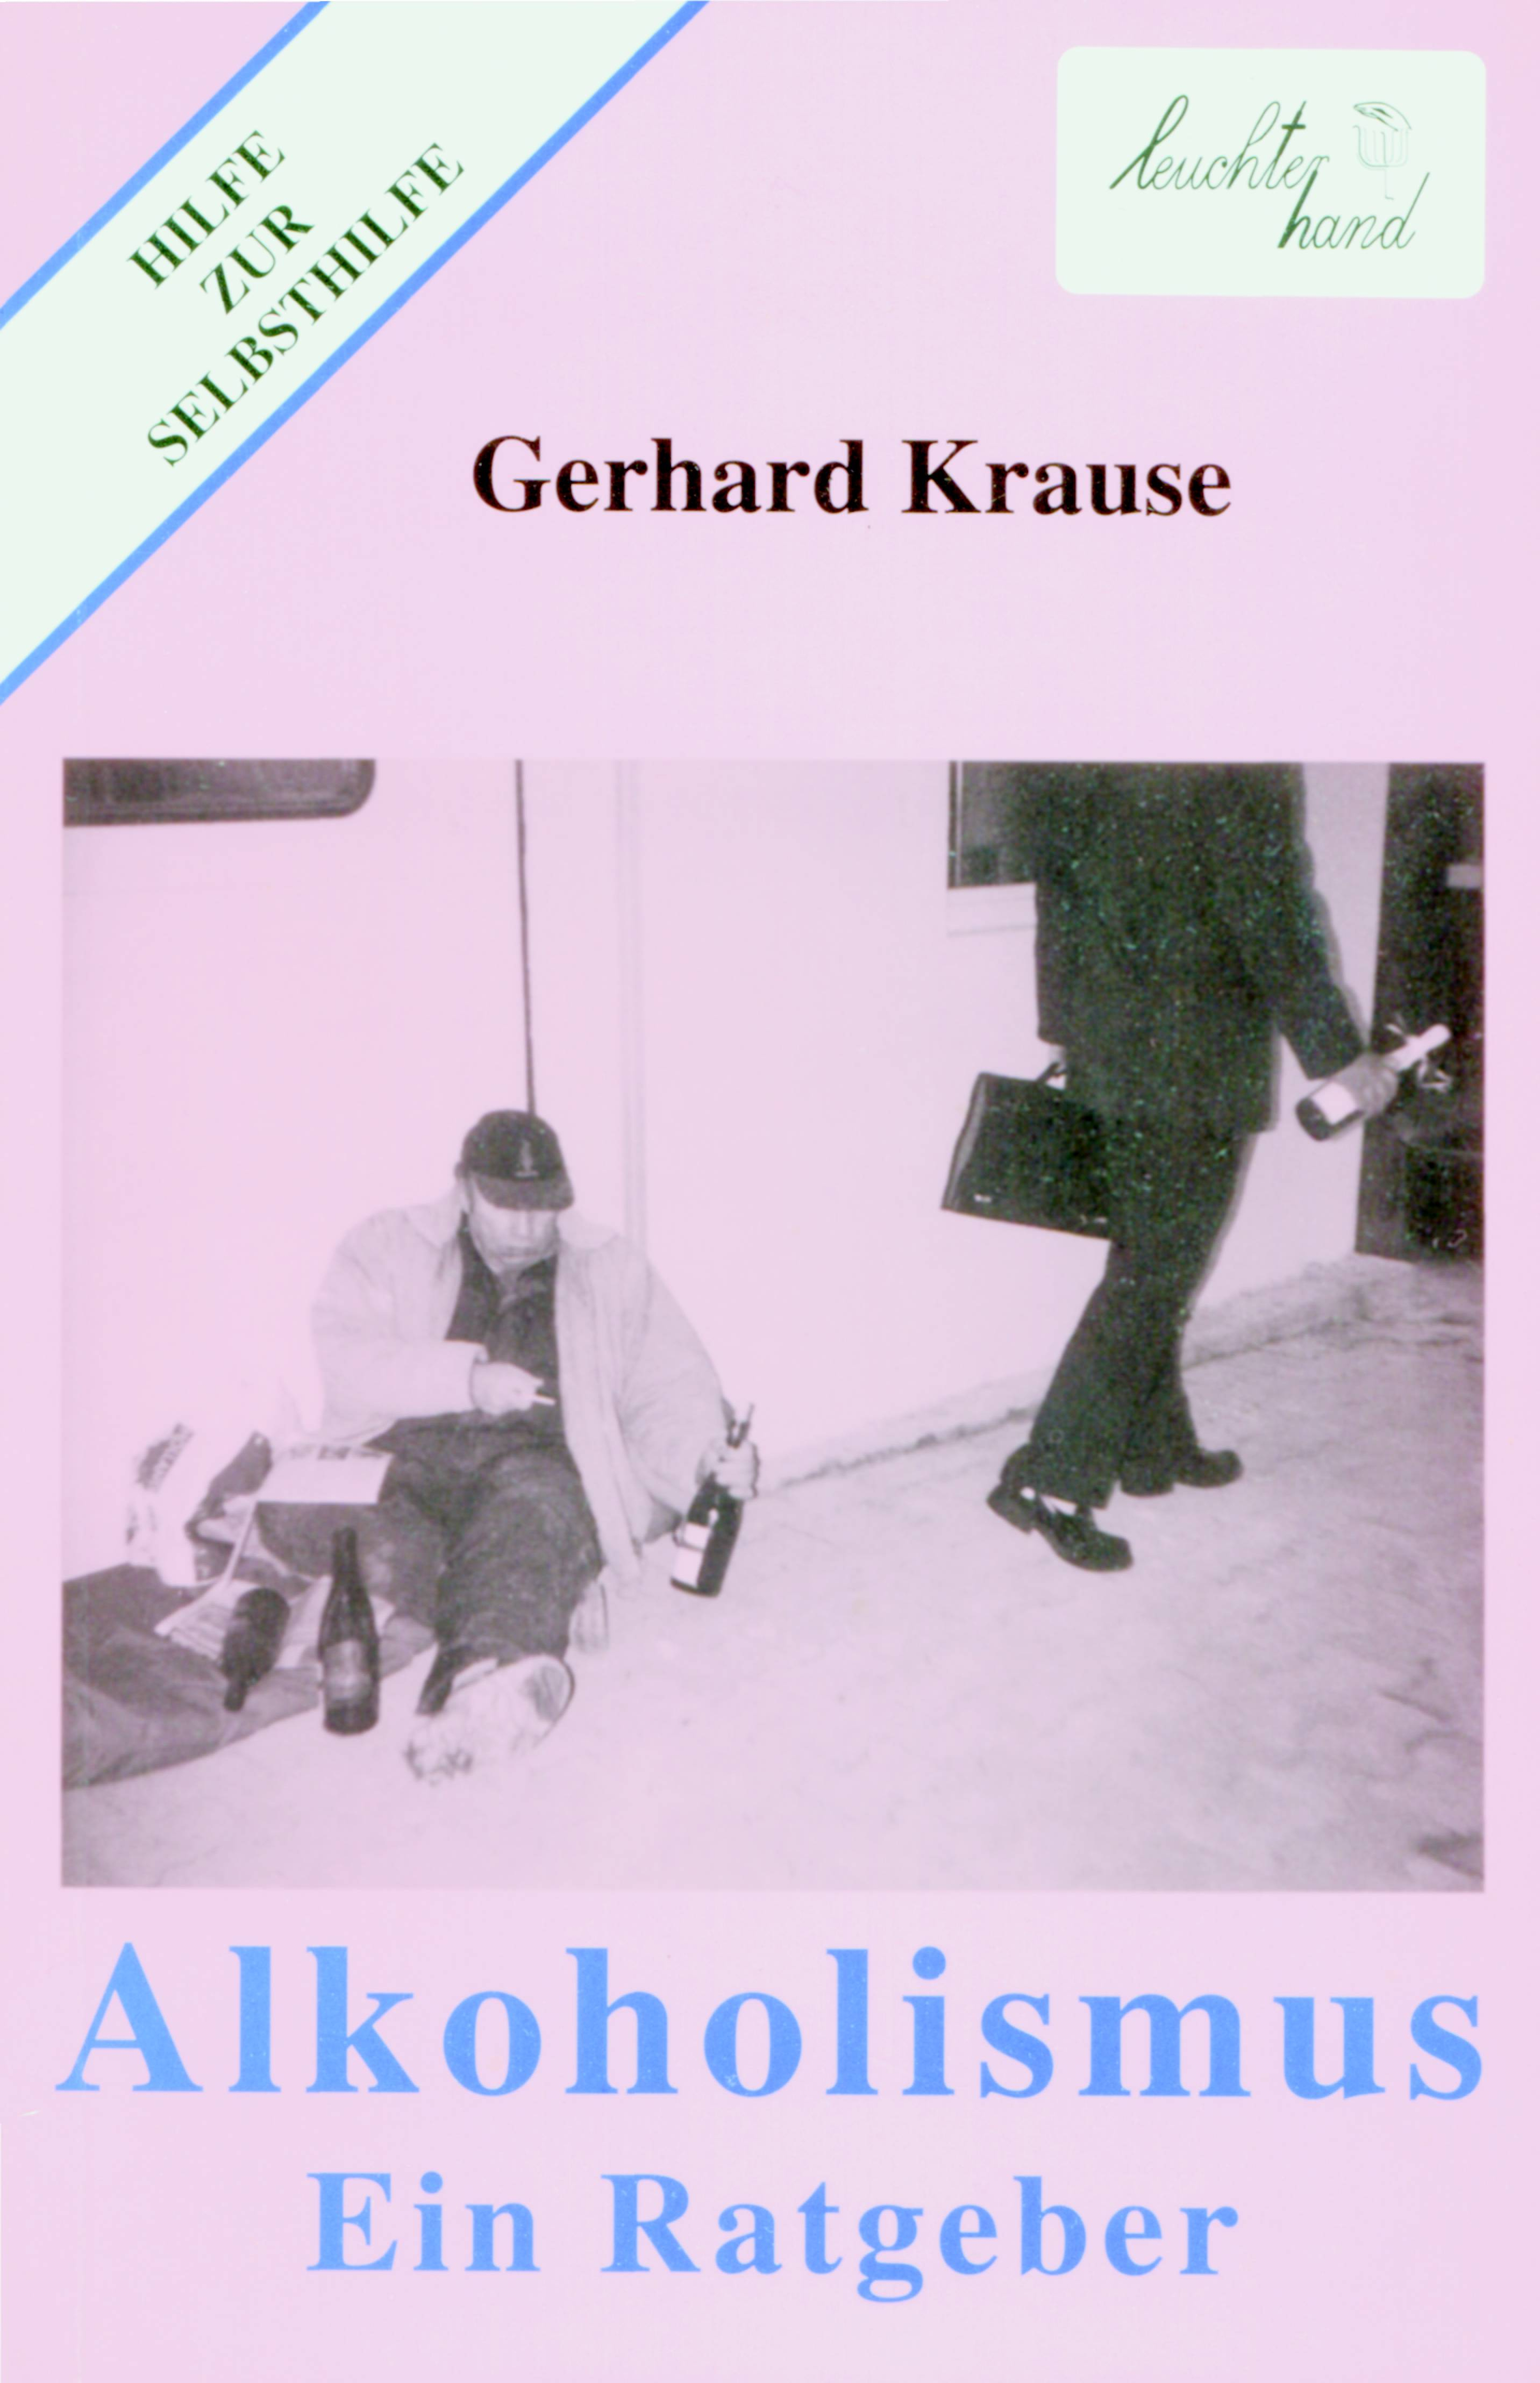 Alkoholismus Gerhard Krause